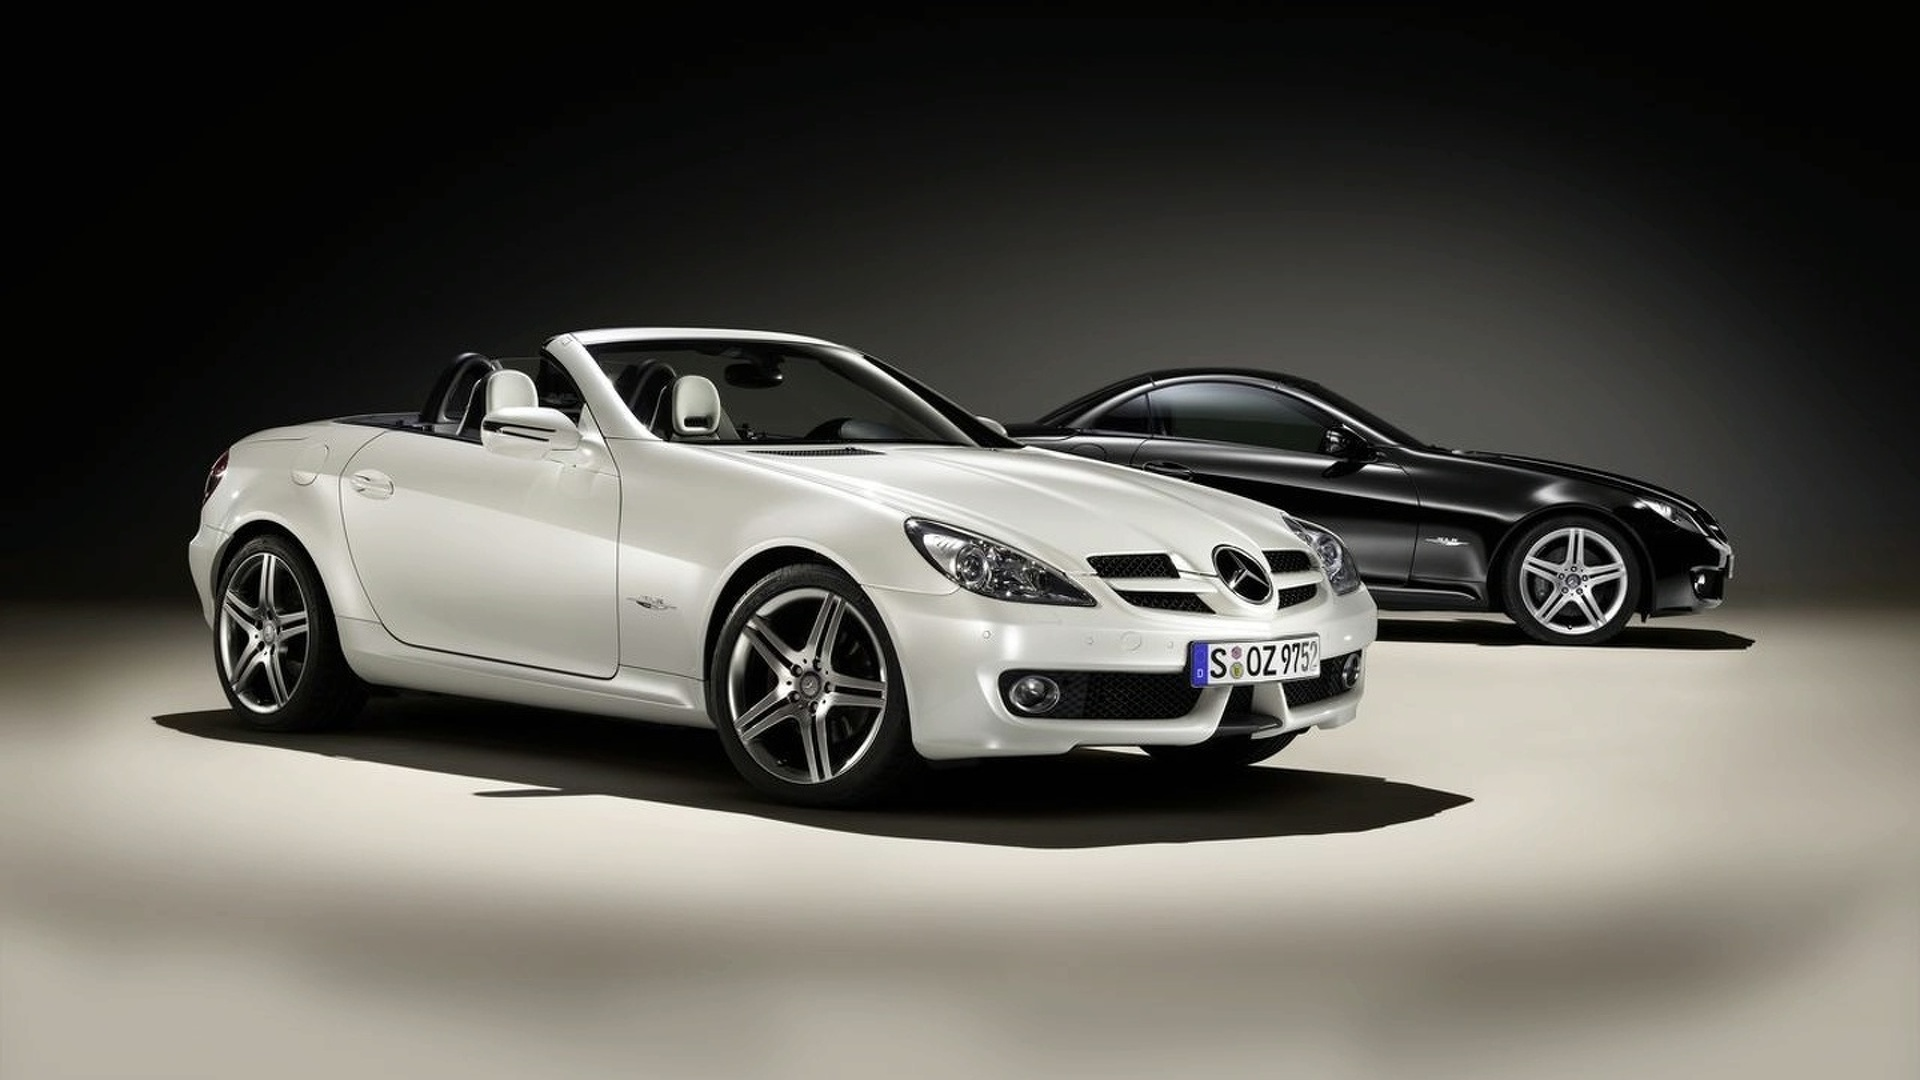 Mercedes-Benz SLK 2LOOK Edition Released in Geneva